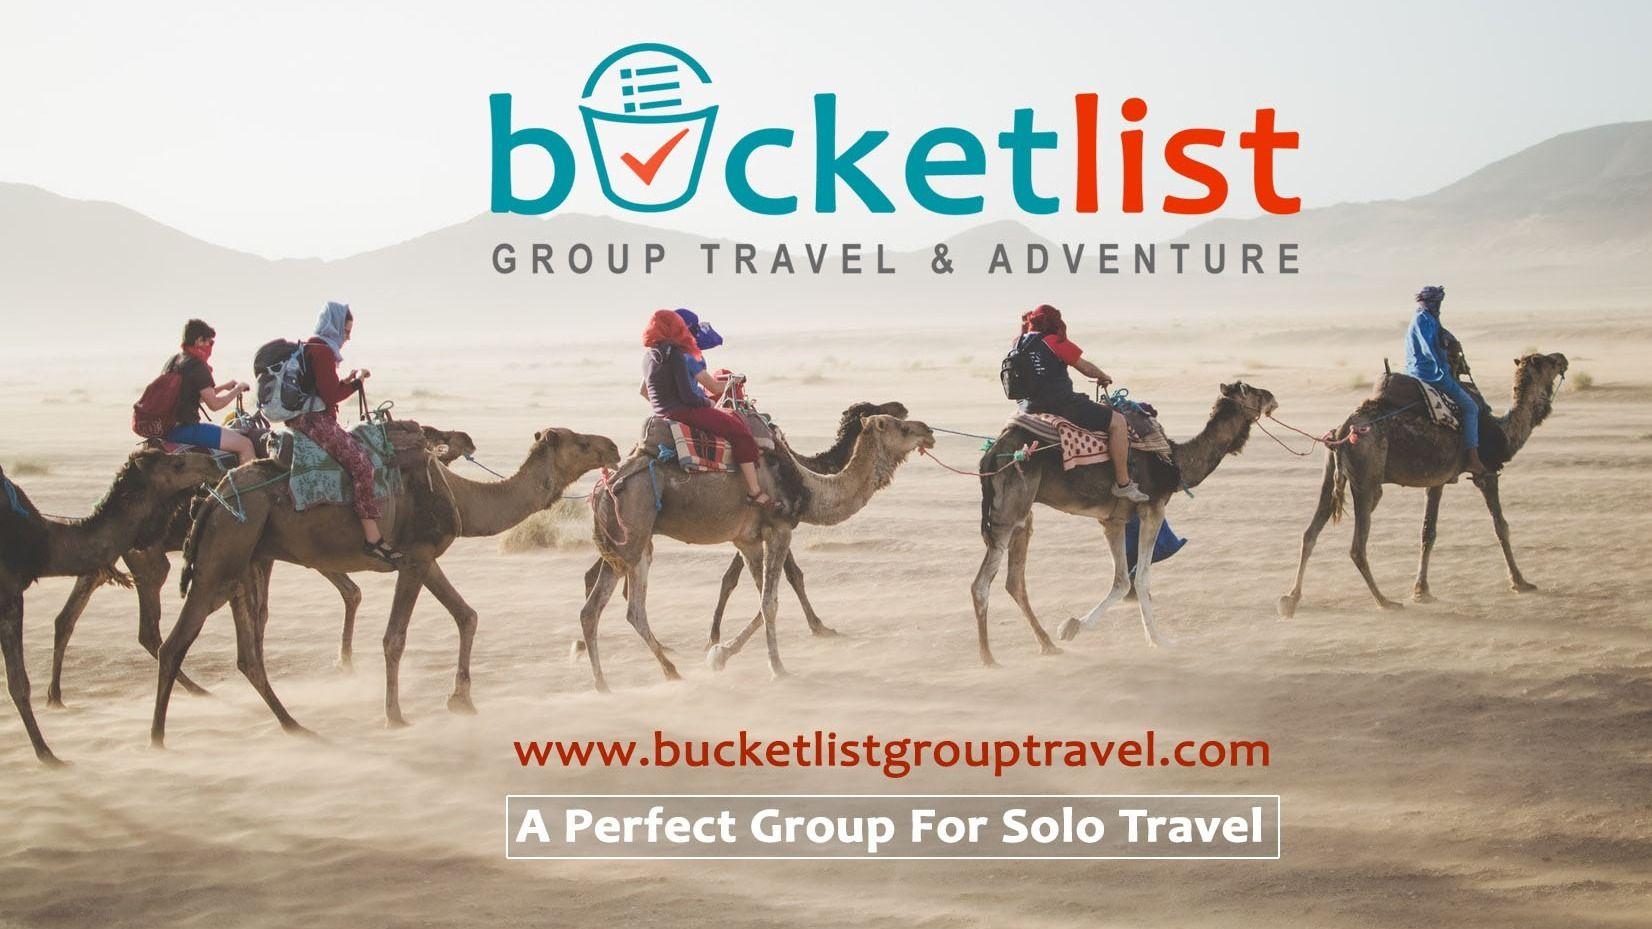 Chicago - Bucket List Group Travel